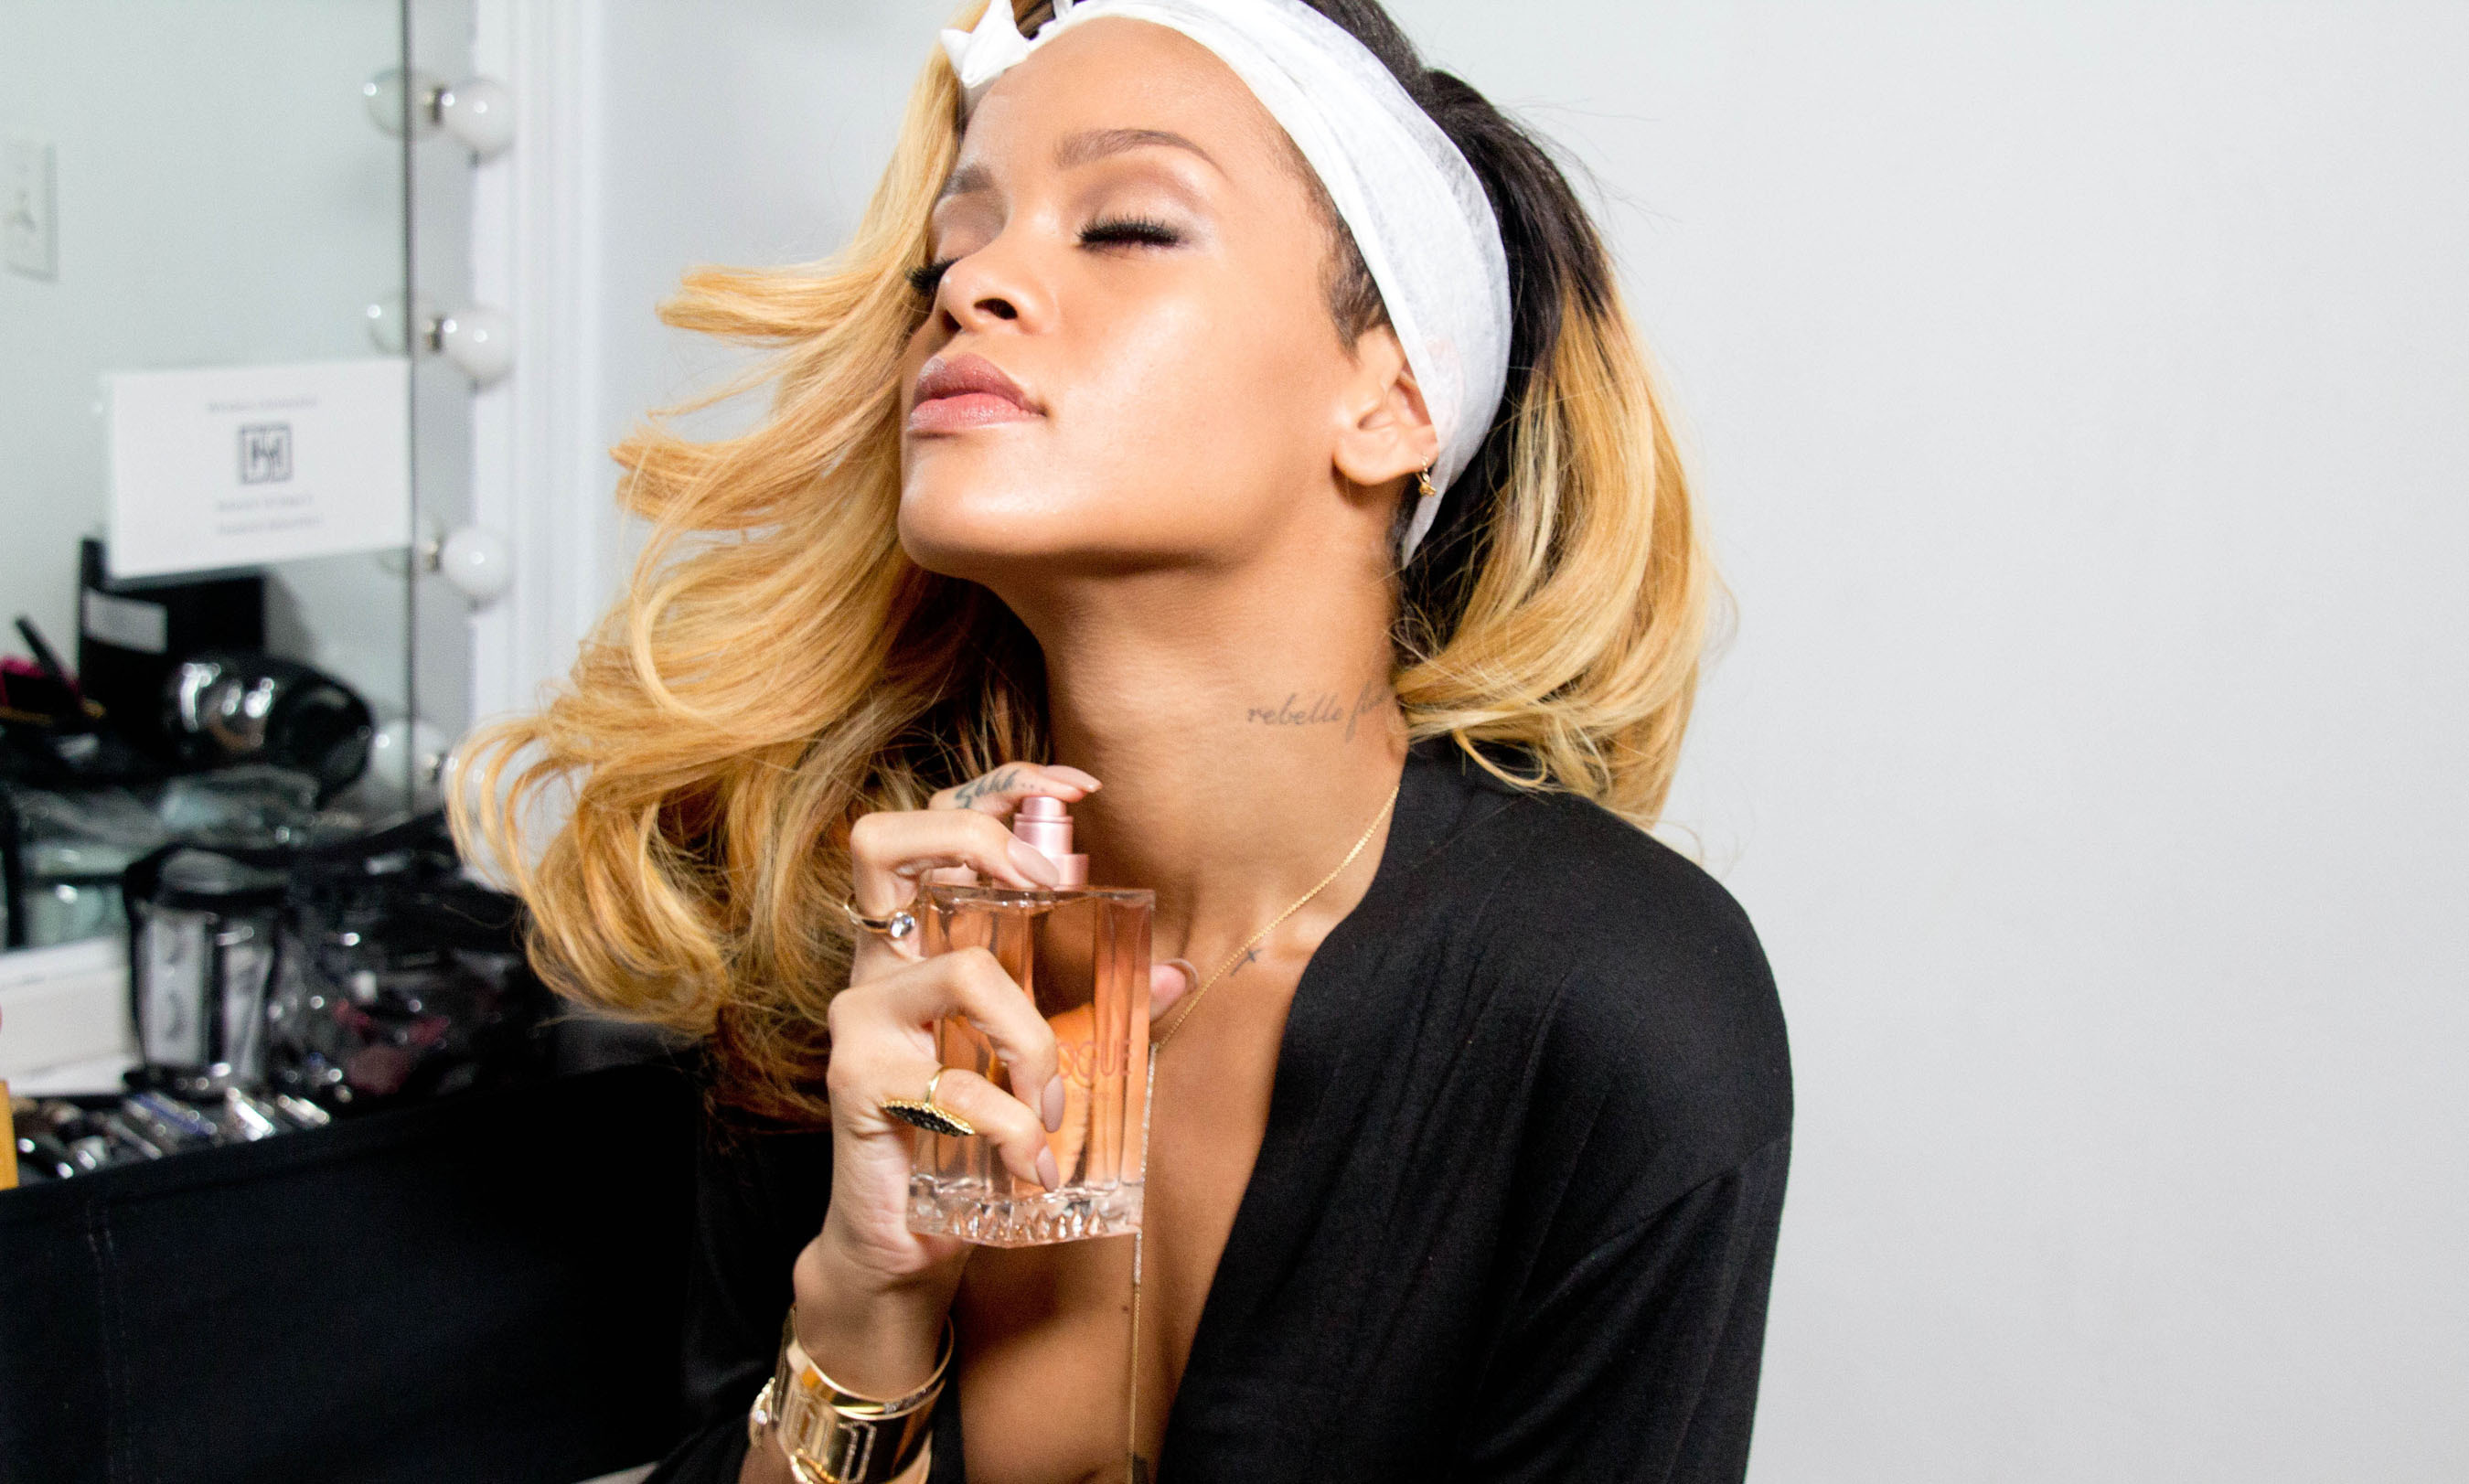 Rihanna Launches Latest Fragrance Rogue by Rihanna